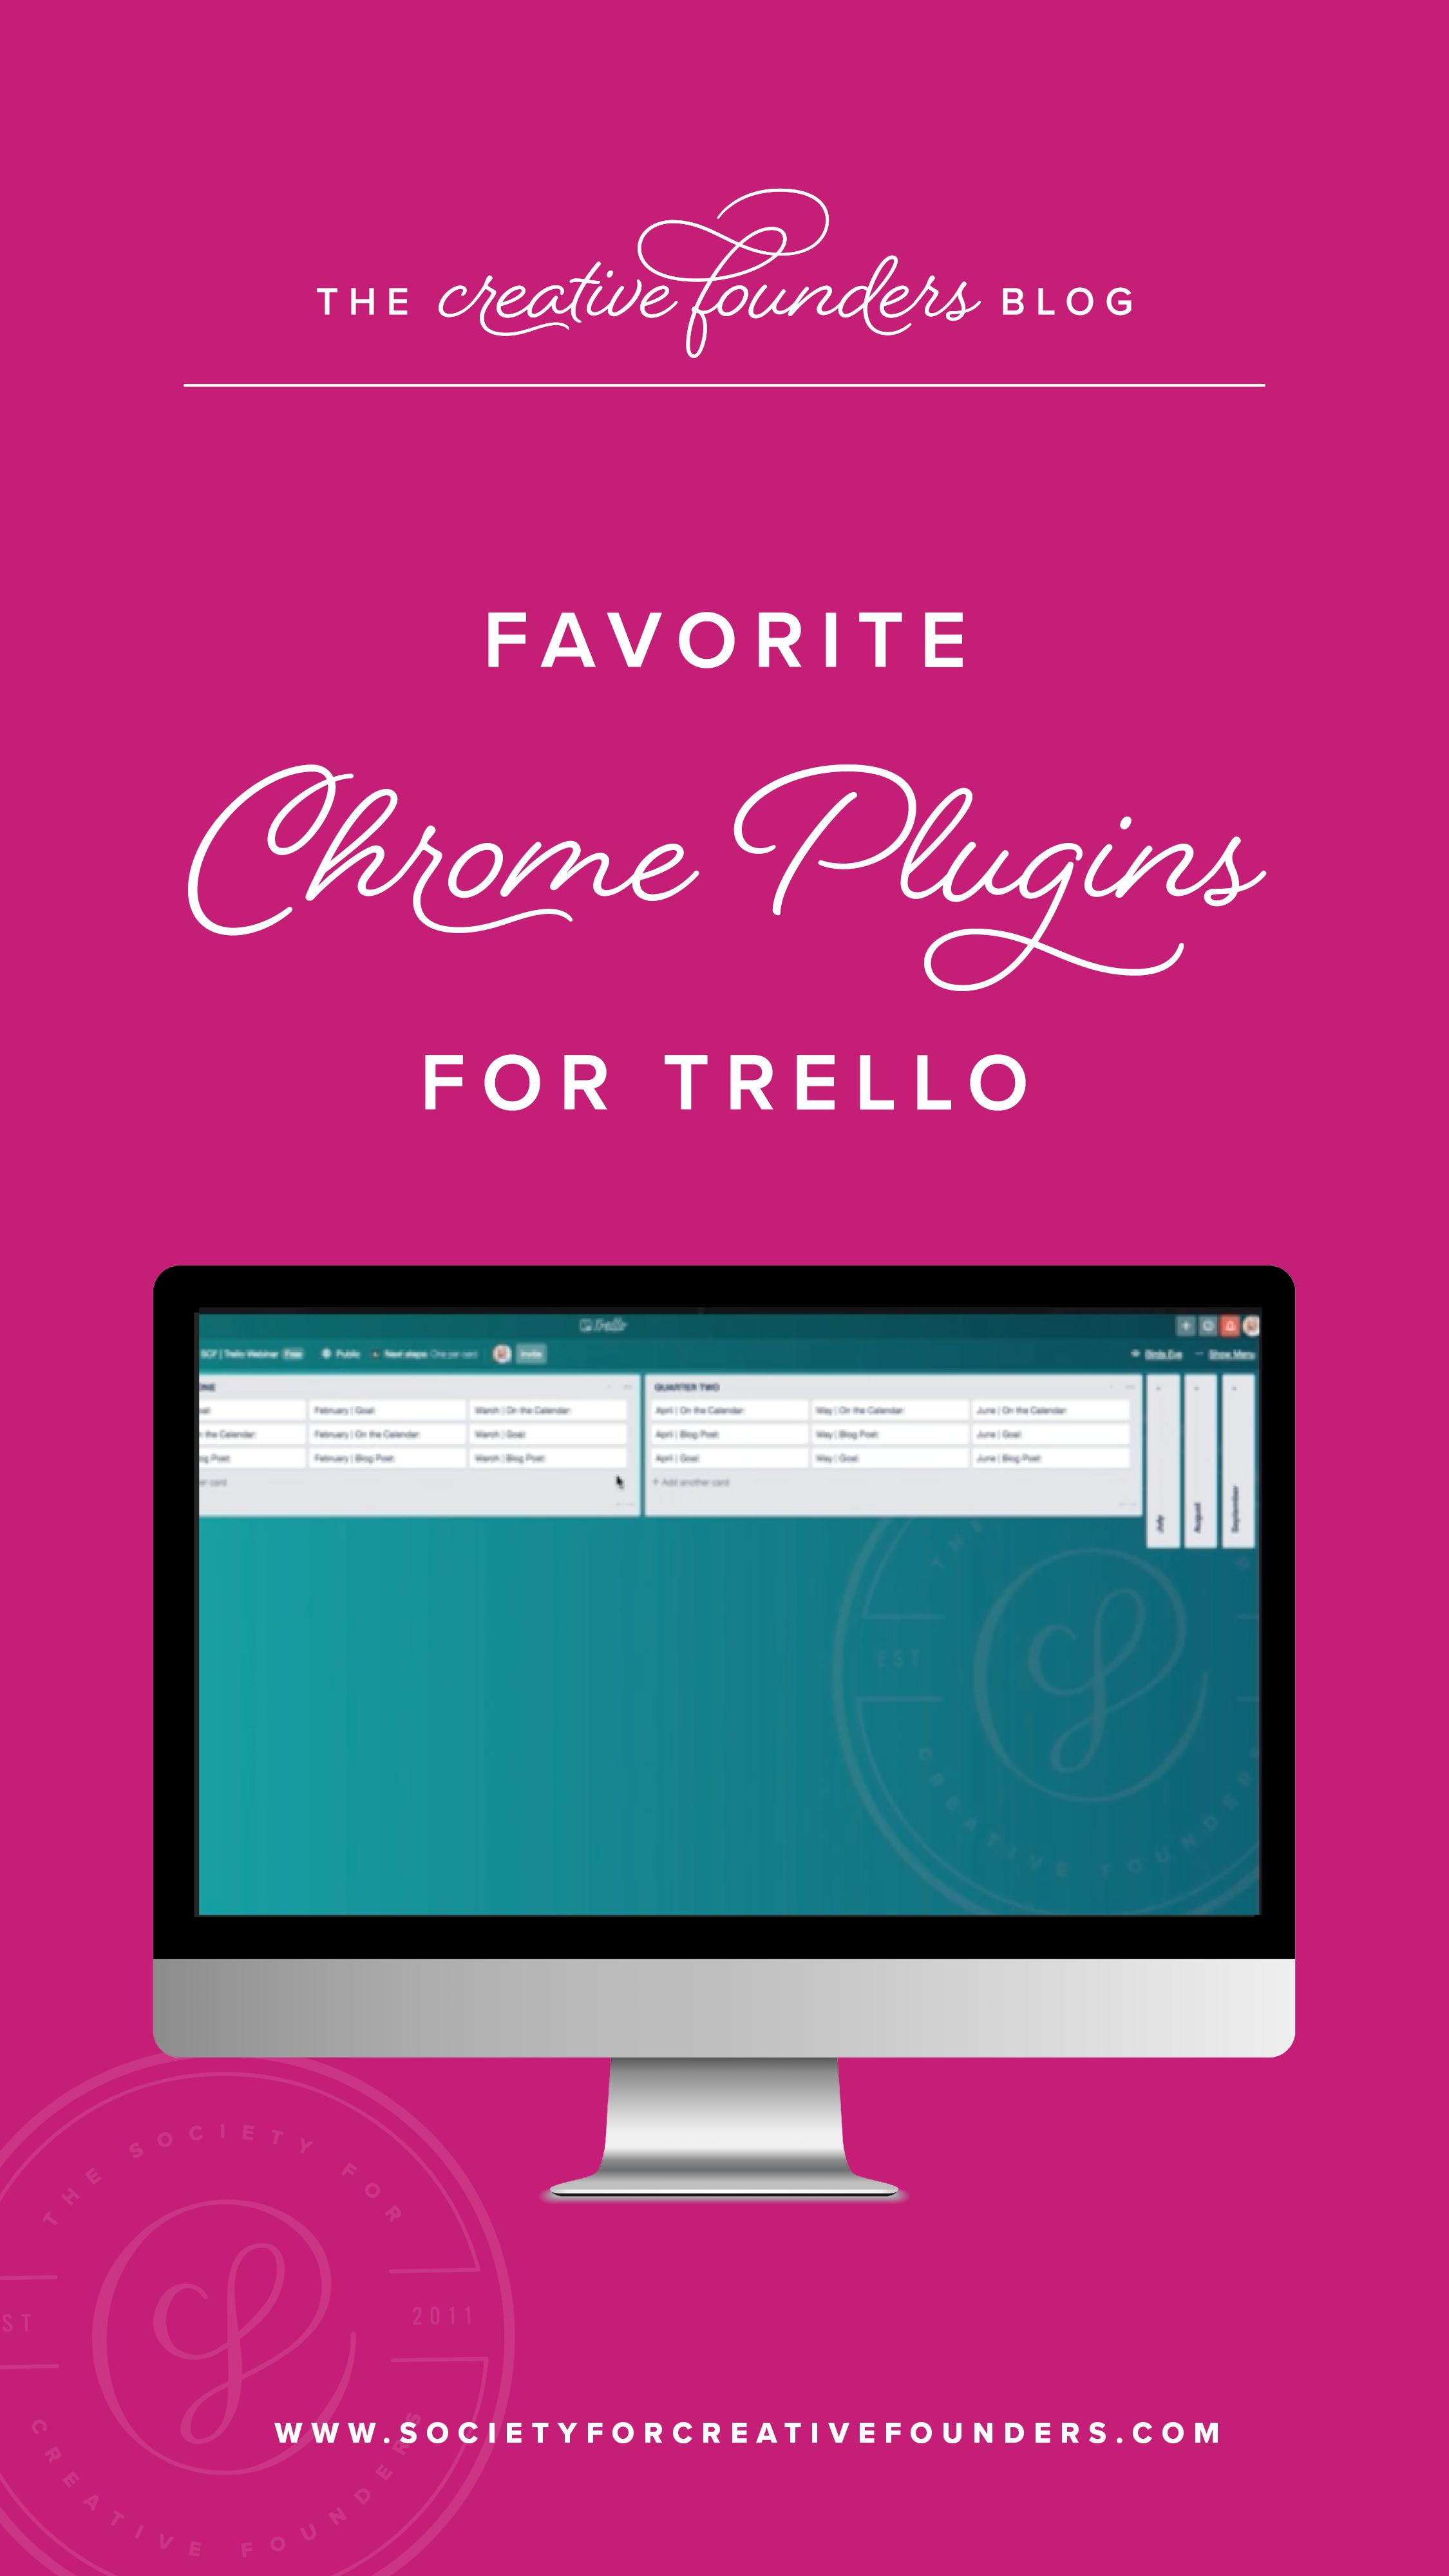 Favorite Chrome Plugins for Trello